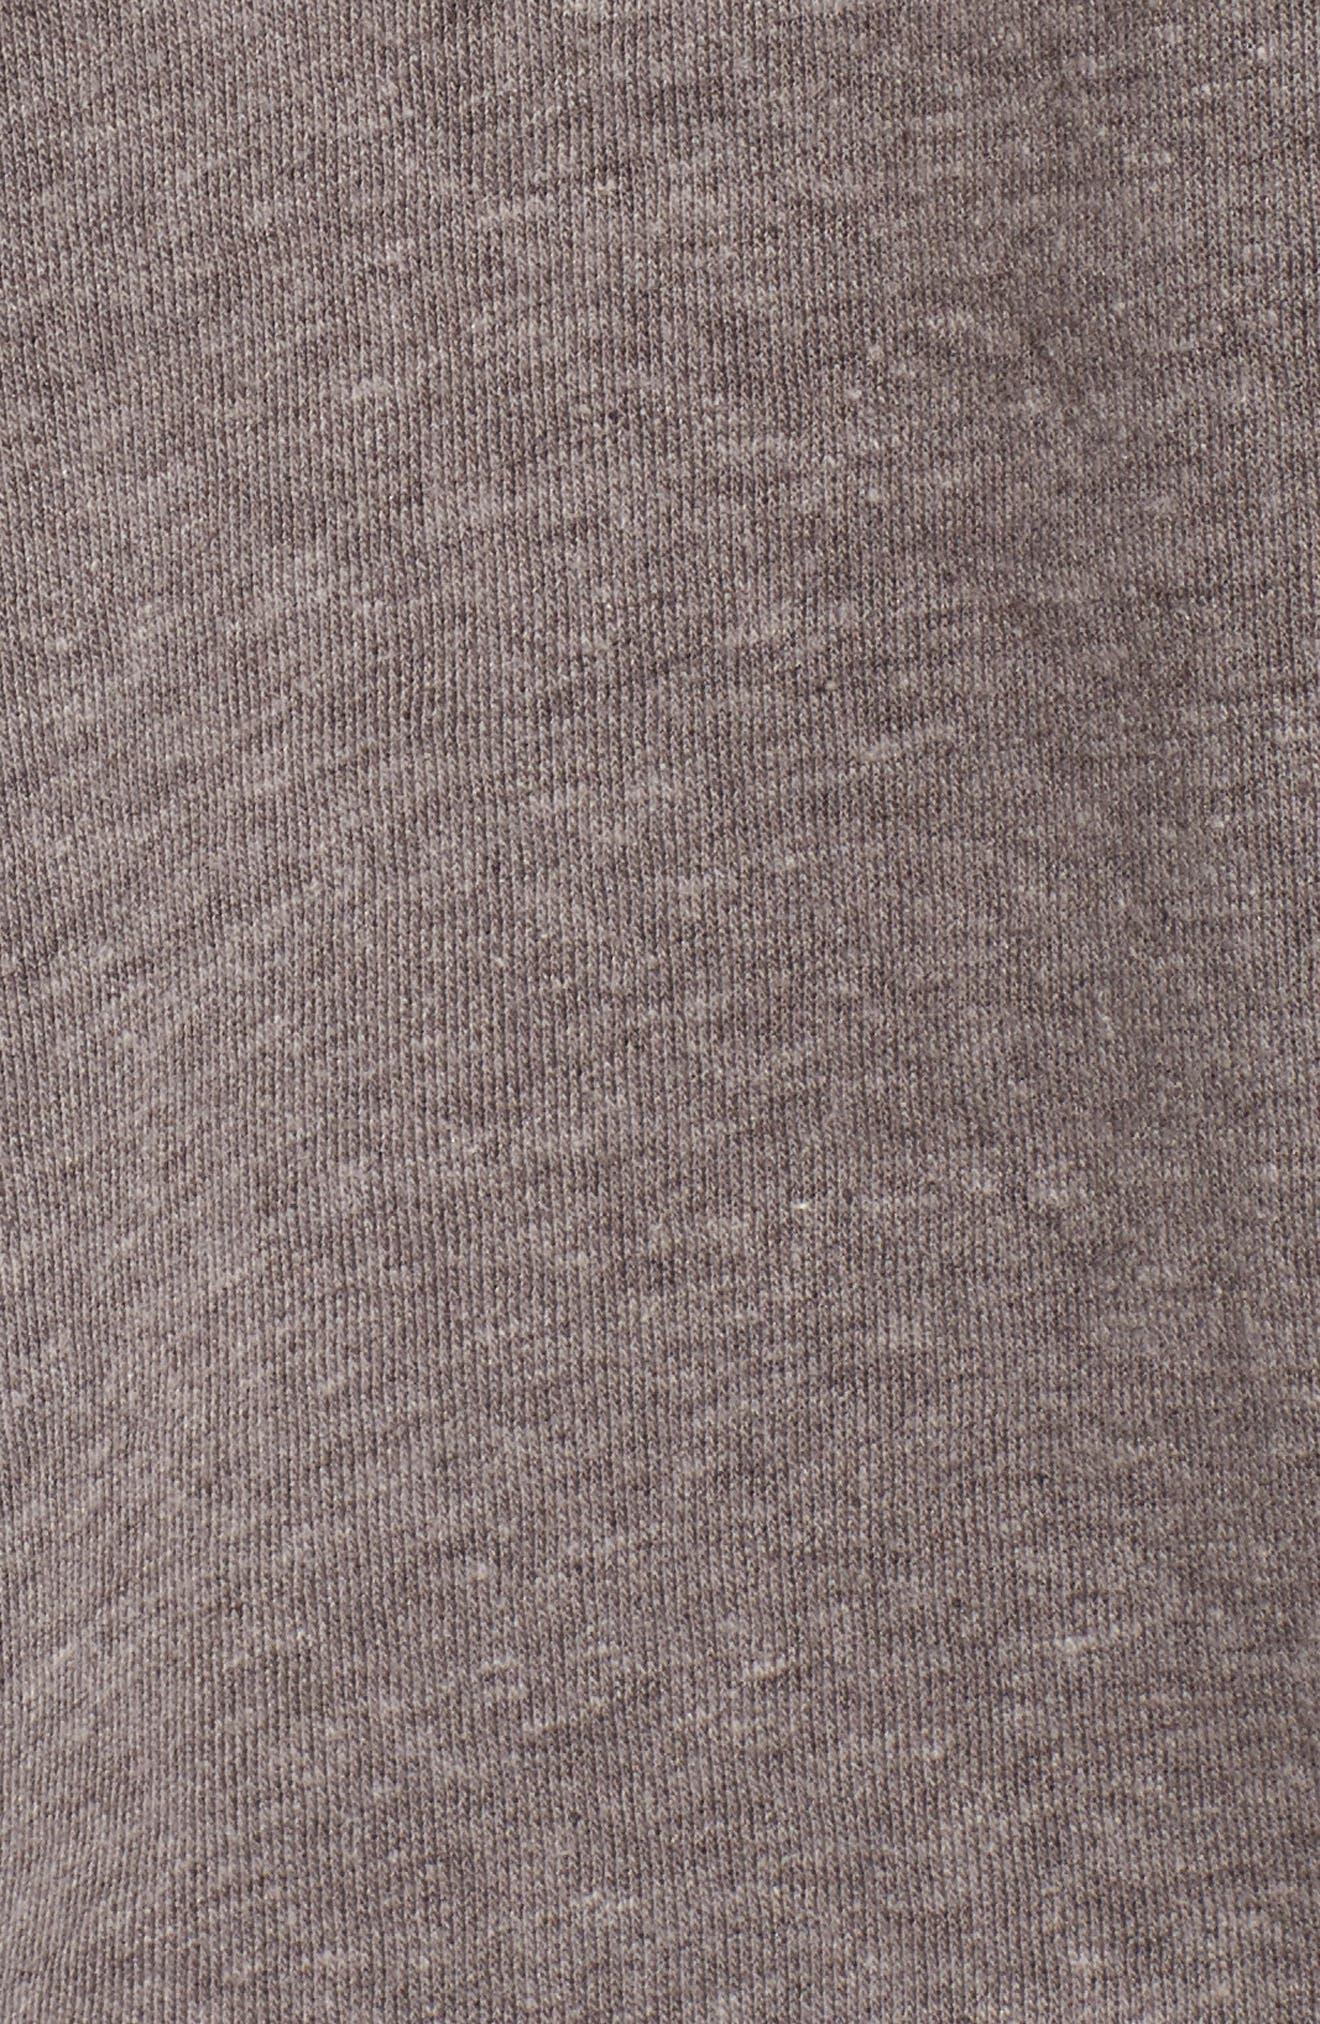 Golden Girls Willow Sweatshirt,                             Alternate thumbnail 6, color,                             050